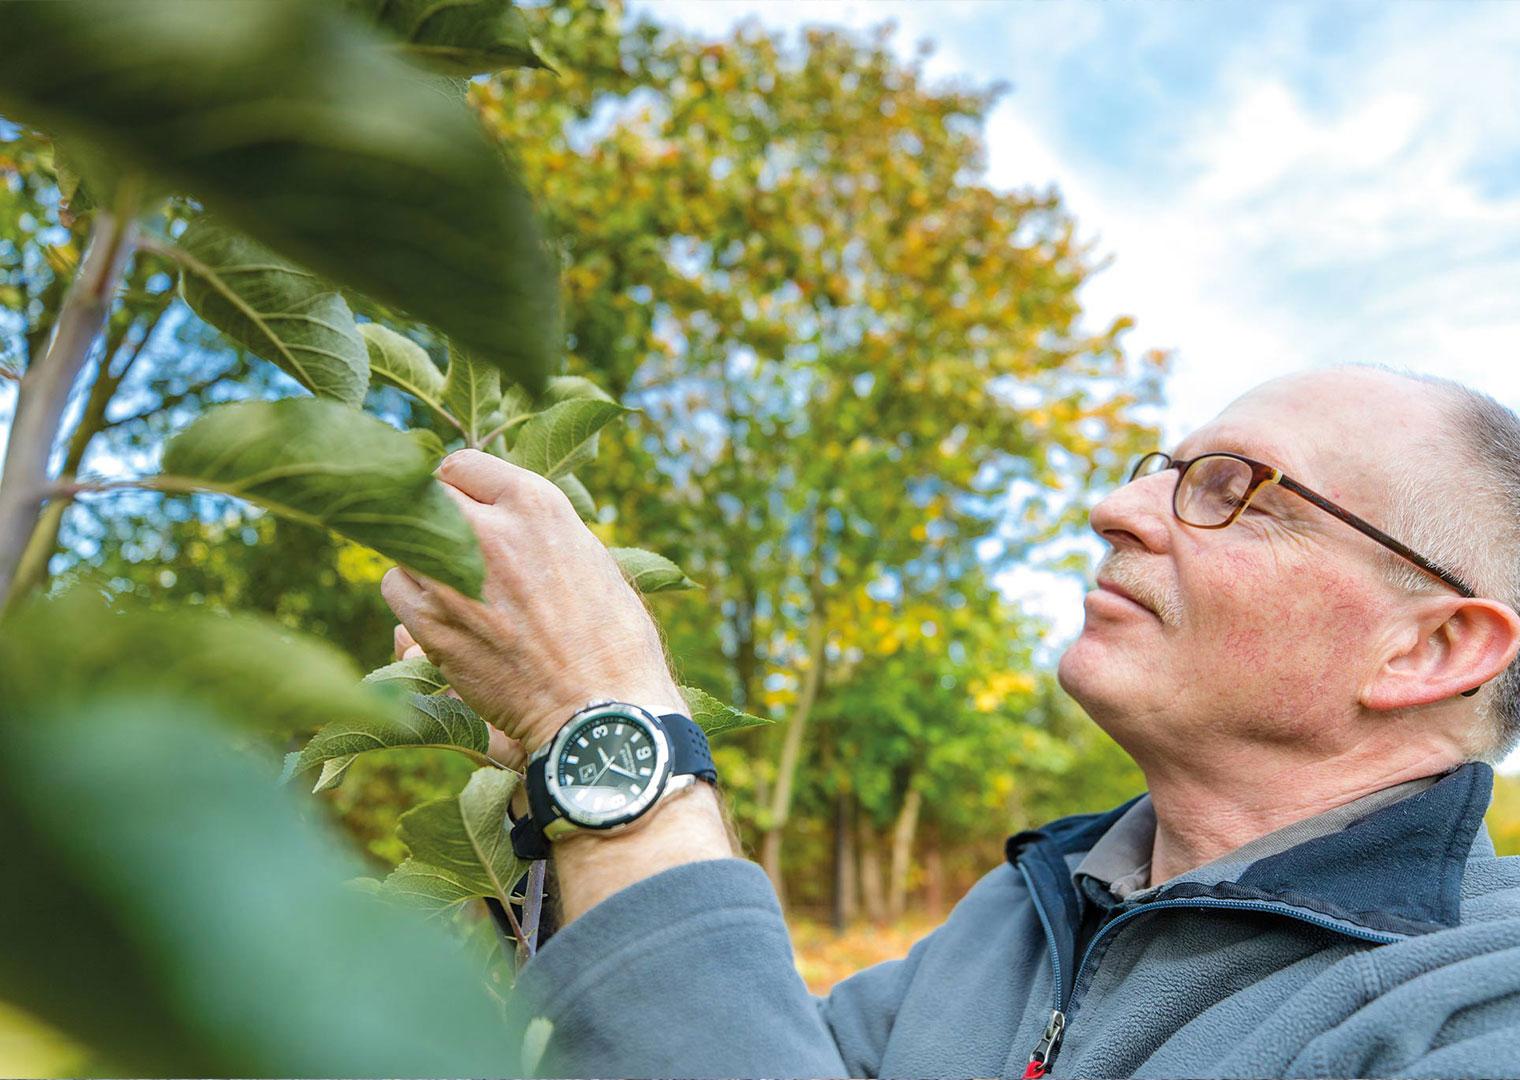 Obstbaumschnitt, Baumpflege